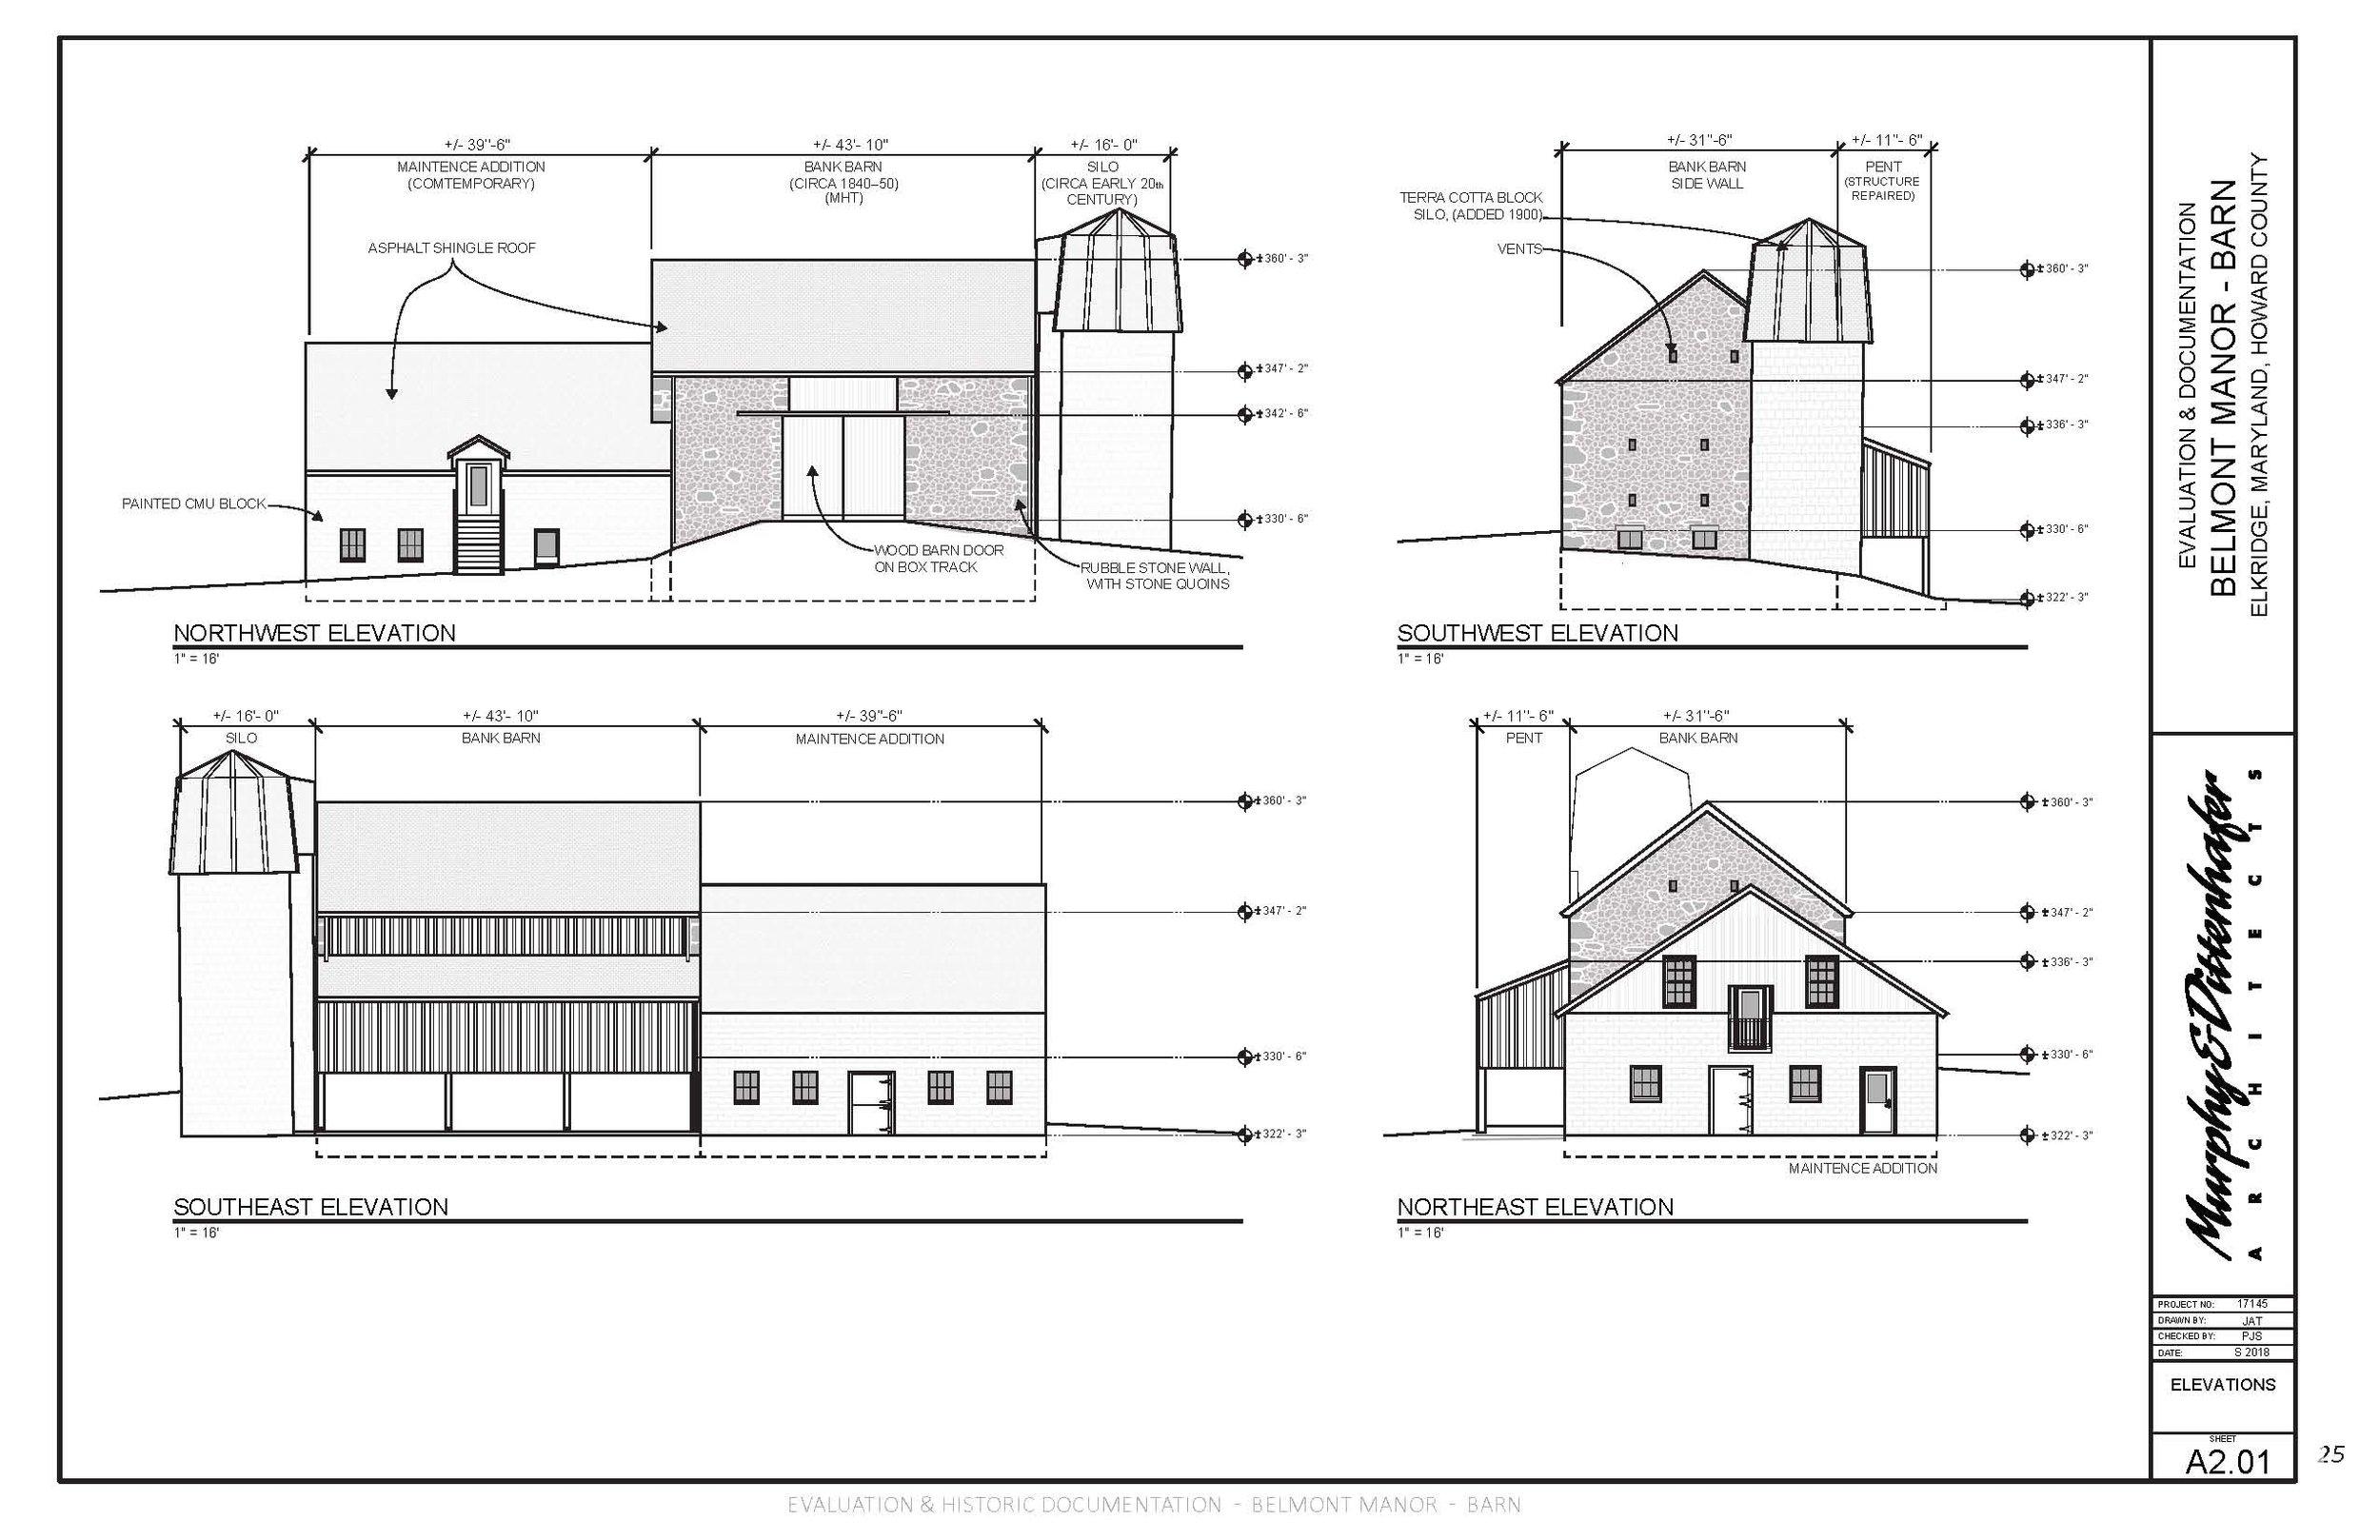 042418_17145 - Belmont Barn Study - Report - Final Draft_Page_29.jpg